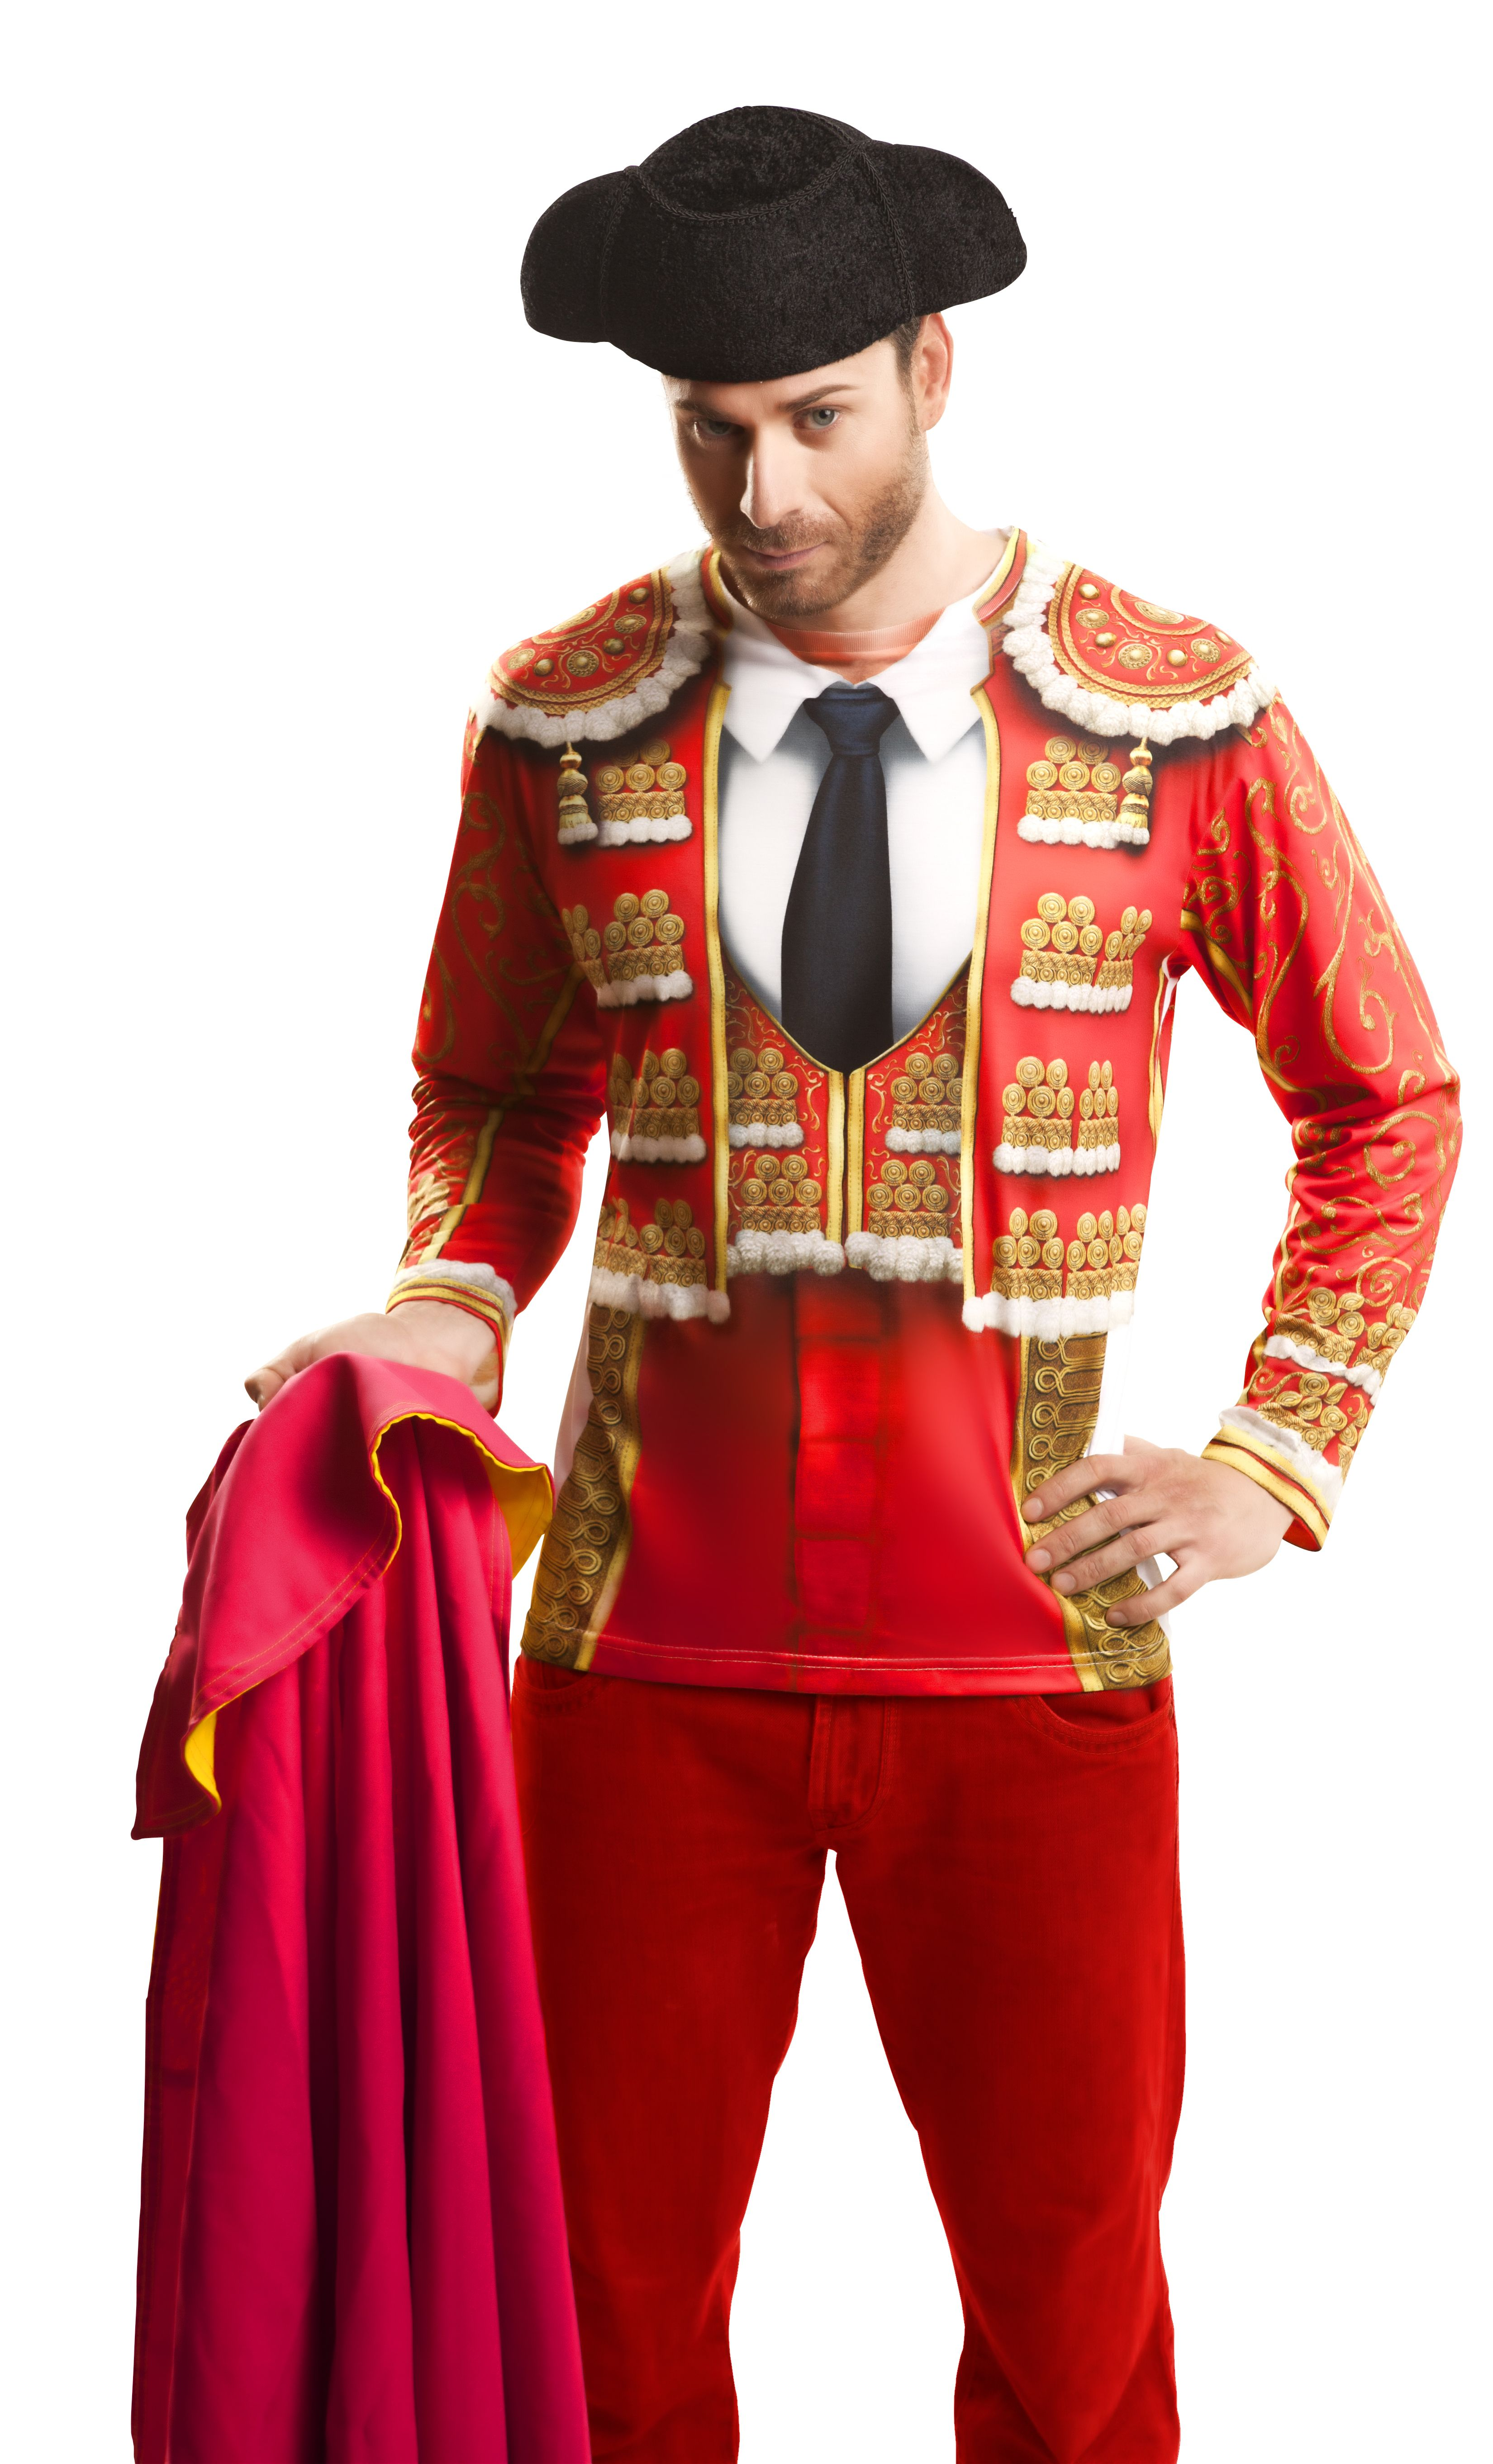 Disfraz Torero.  Costume  Costumes  Disfraz  Disfraces  Originales  Famous   Torero  Olé  Arte 90c9b0c9504